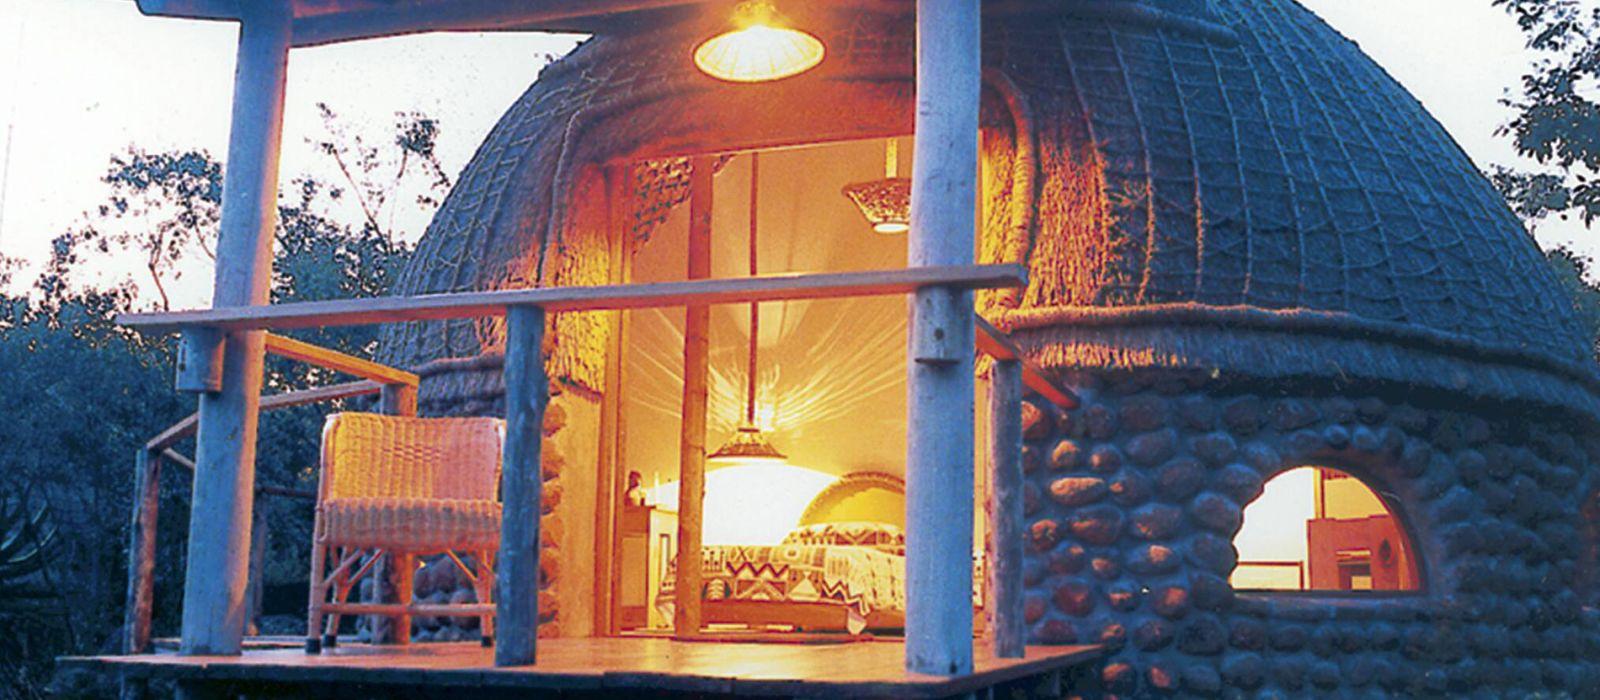 Hotel Isibindi Zulu Lodge South Africa